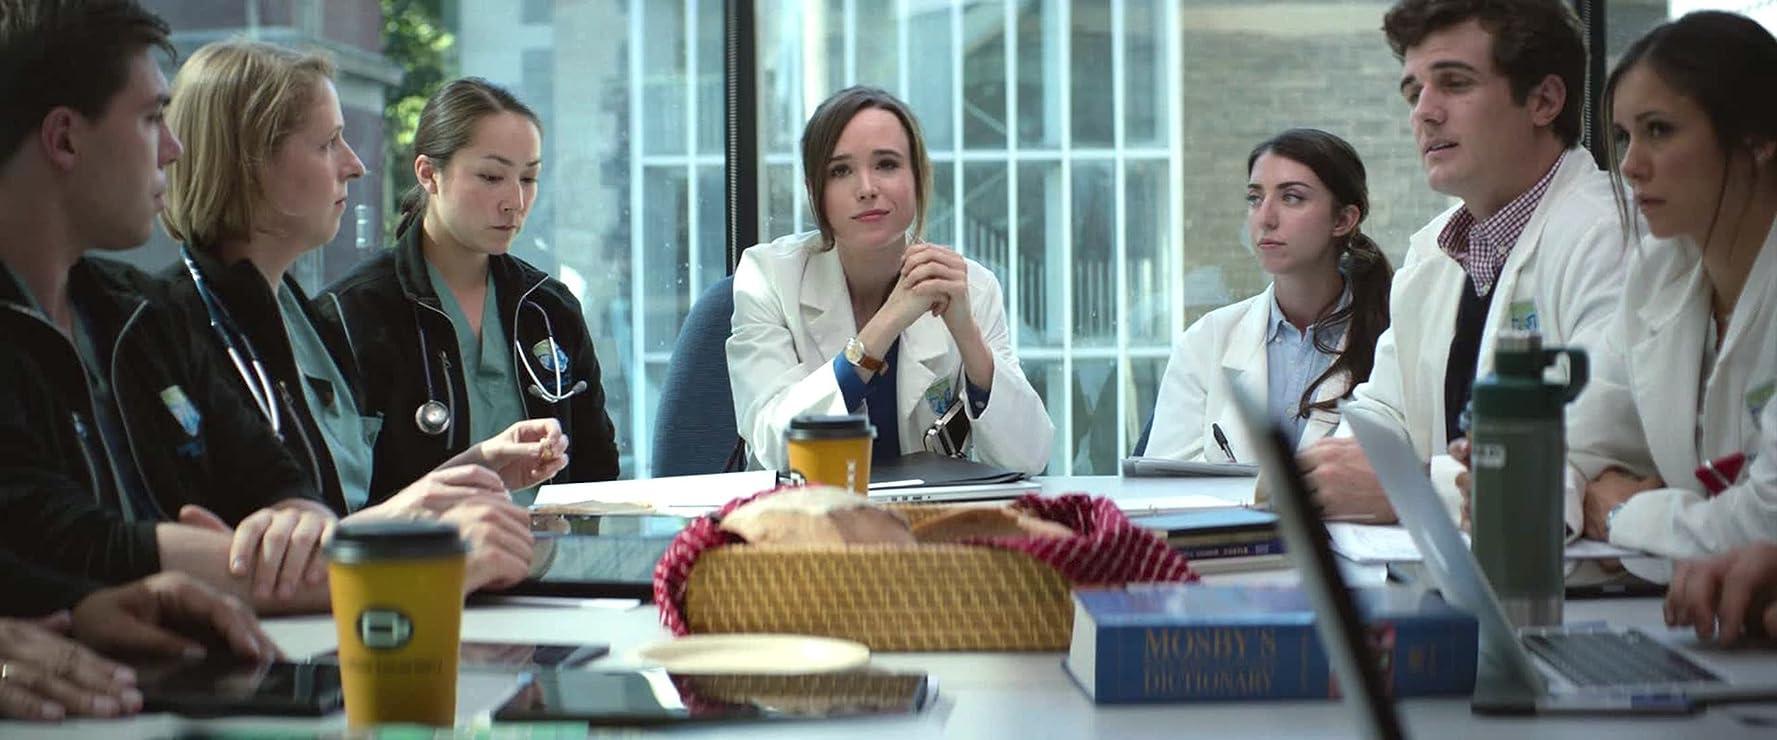 Ellen Page, Martha Girvin, Beau Mirchoff, Nina Dobrev, Emily Piggford, and Jelena Savic in Flatliners (2017)